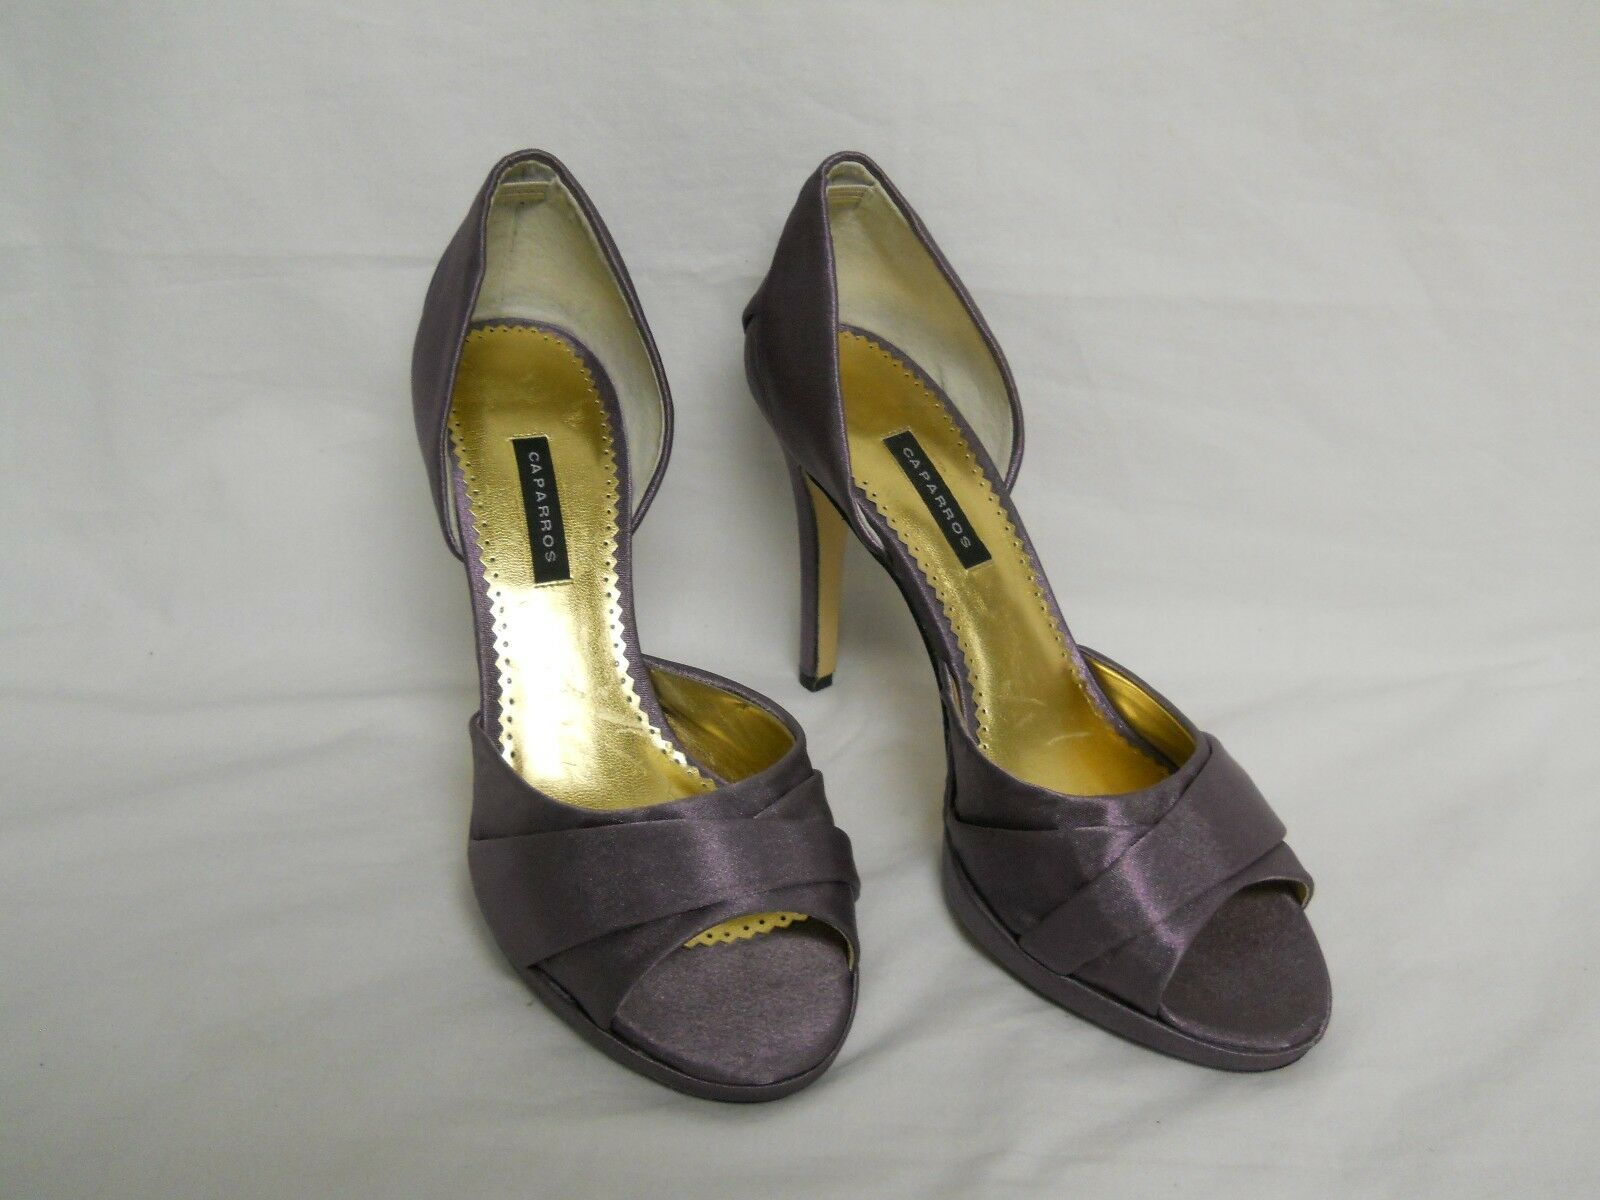 forniamo il meglio Caparros New donna Lizzie Nightfall Crepe Open Toe D'Orsay Heels Heels Heels 9 M scarpe NWOB  protezione post-vendita